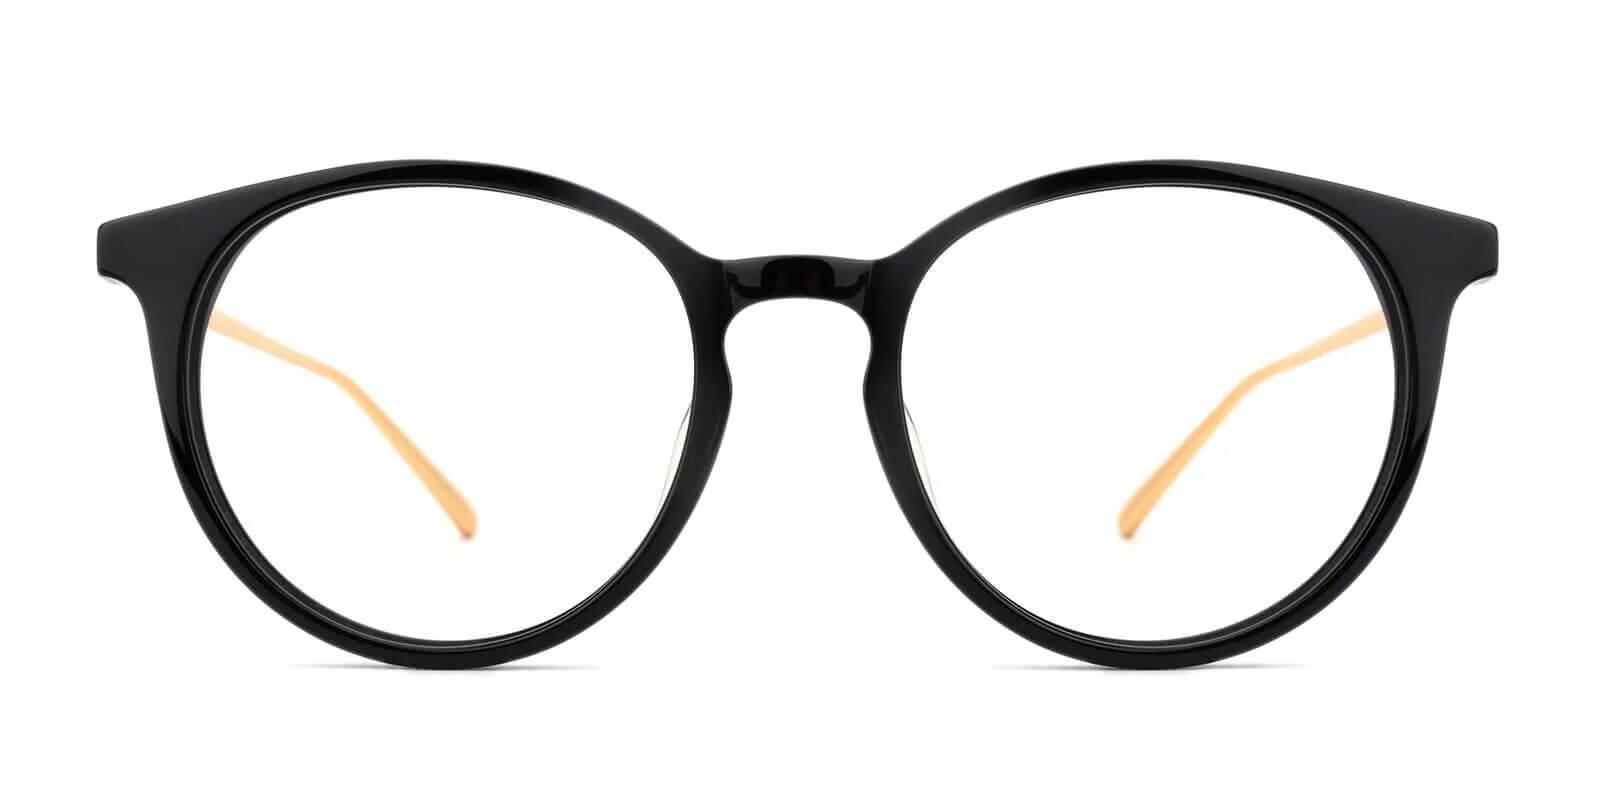 Urban Black Metal Eyeglasses , UniversalBridgeFit Frames from ABBE Glasses